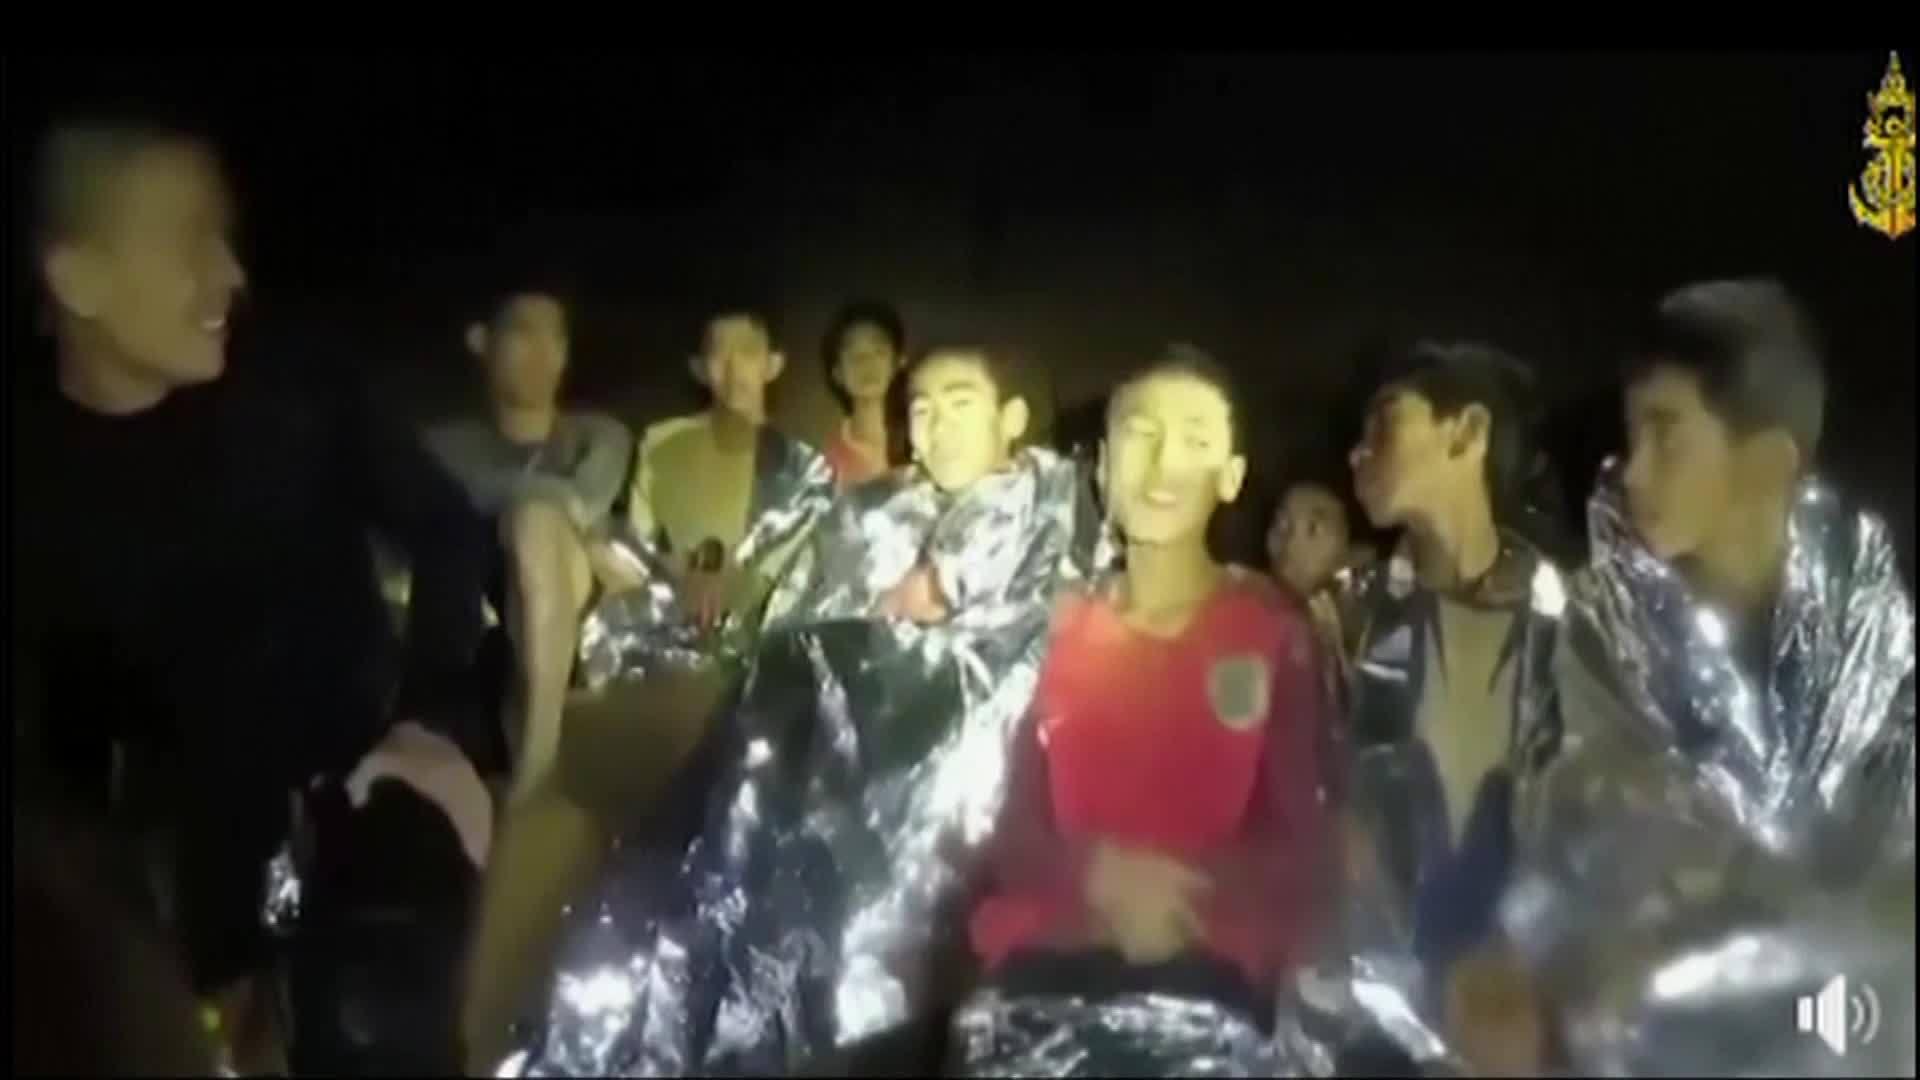 Thai_Cave_Rescue_Movie_Underway_0_20180805201740